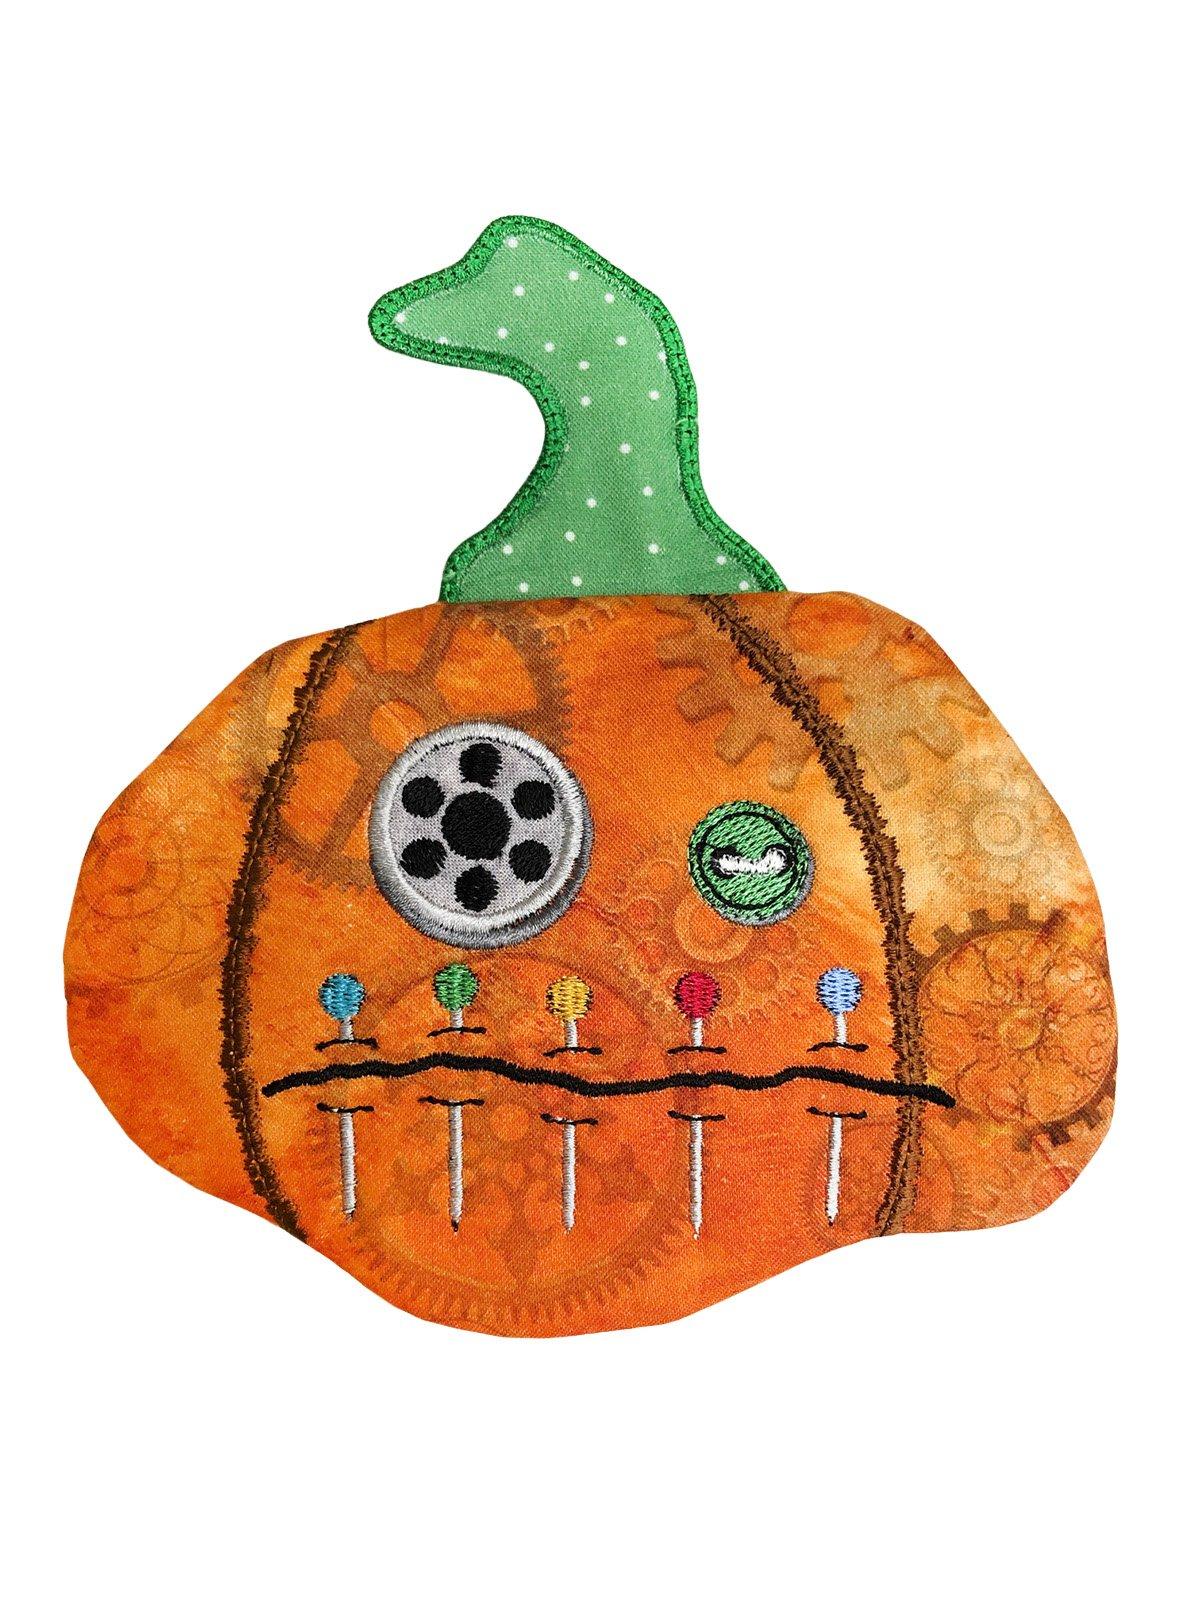 Steampunk Pinhead Pumpkin Pouch Download only- (HQH-06-DDE-E)